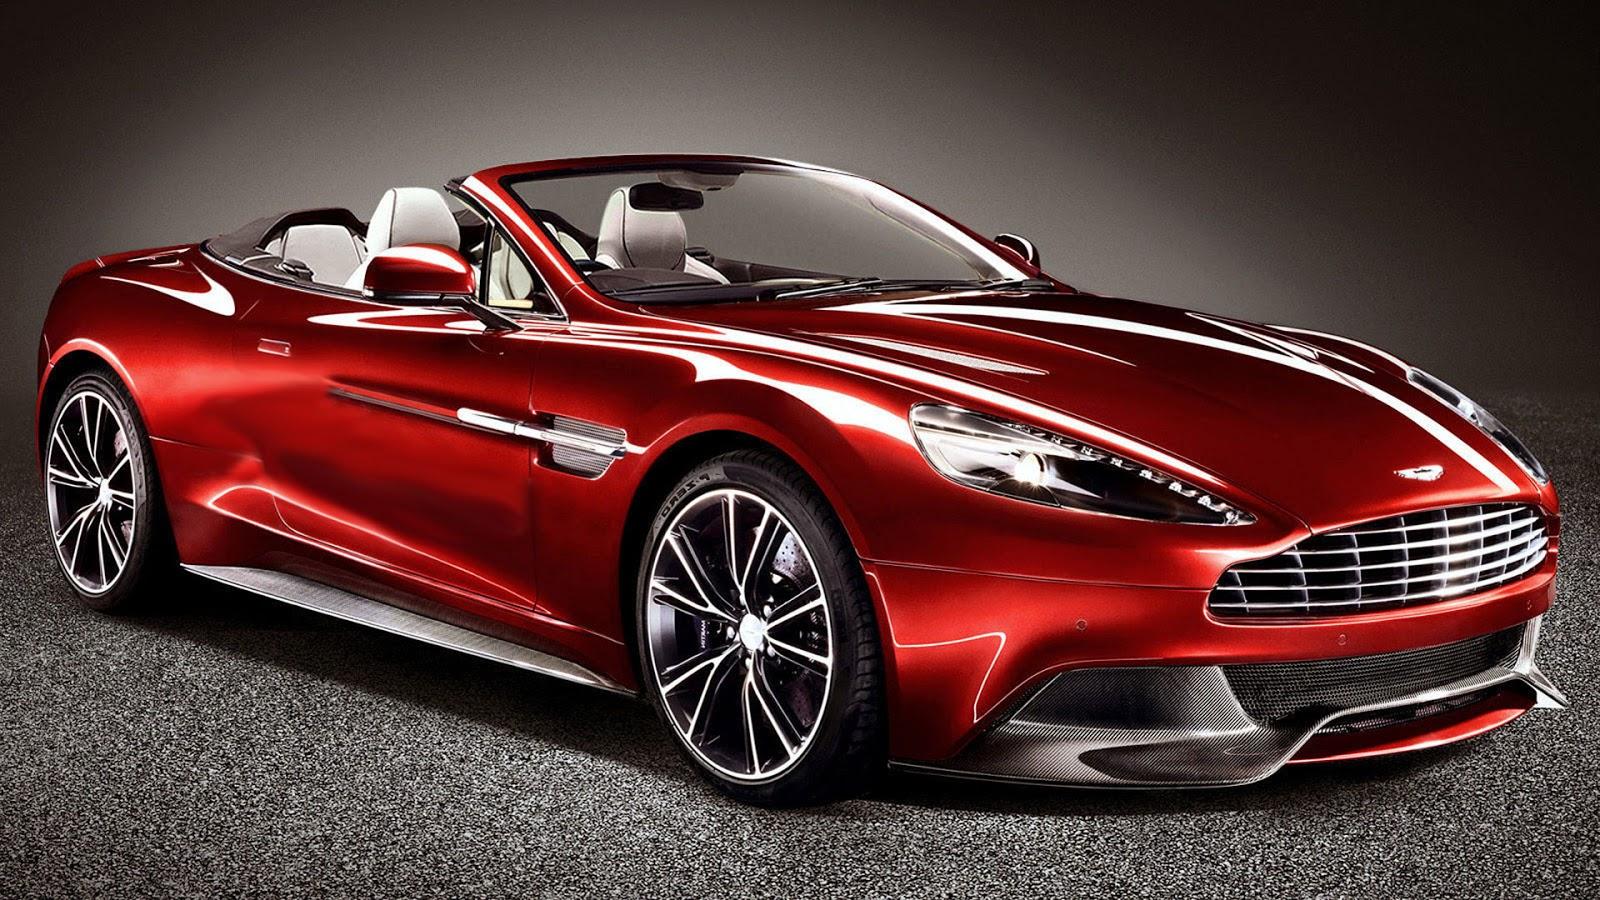 Aston Martin Dbc - Cars Wallpapers | aston martin dbc price